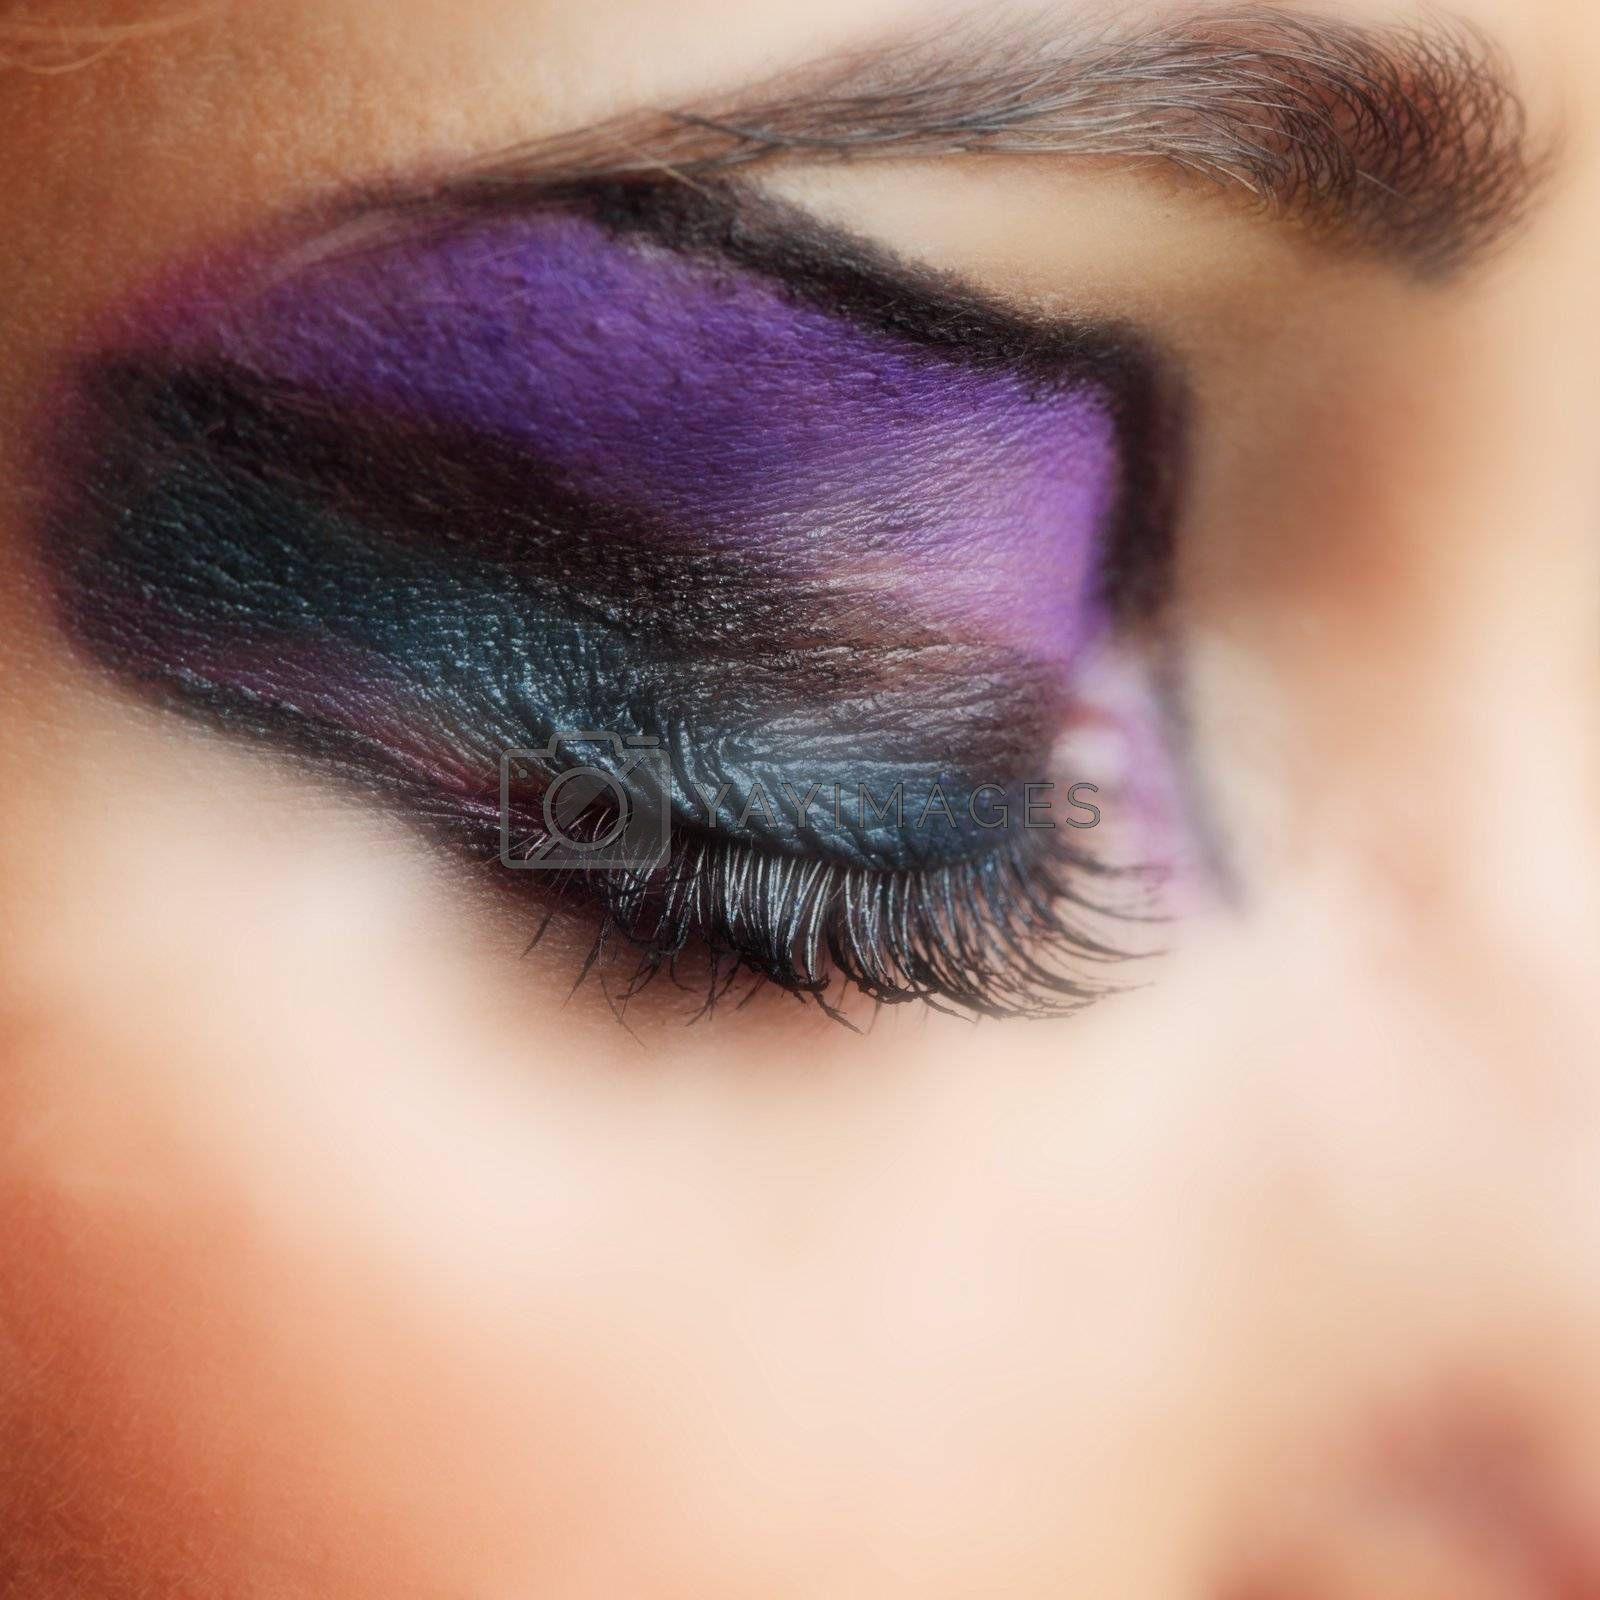 make up close up in studio